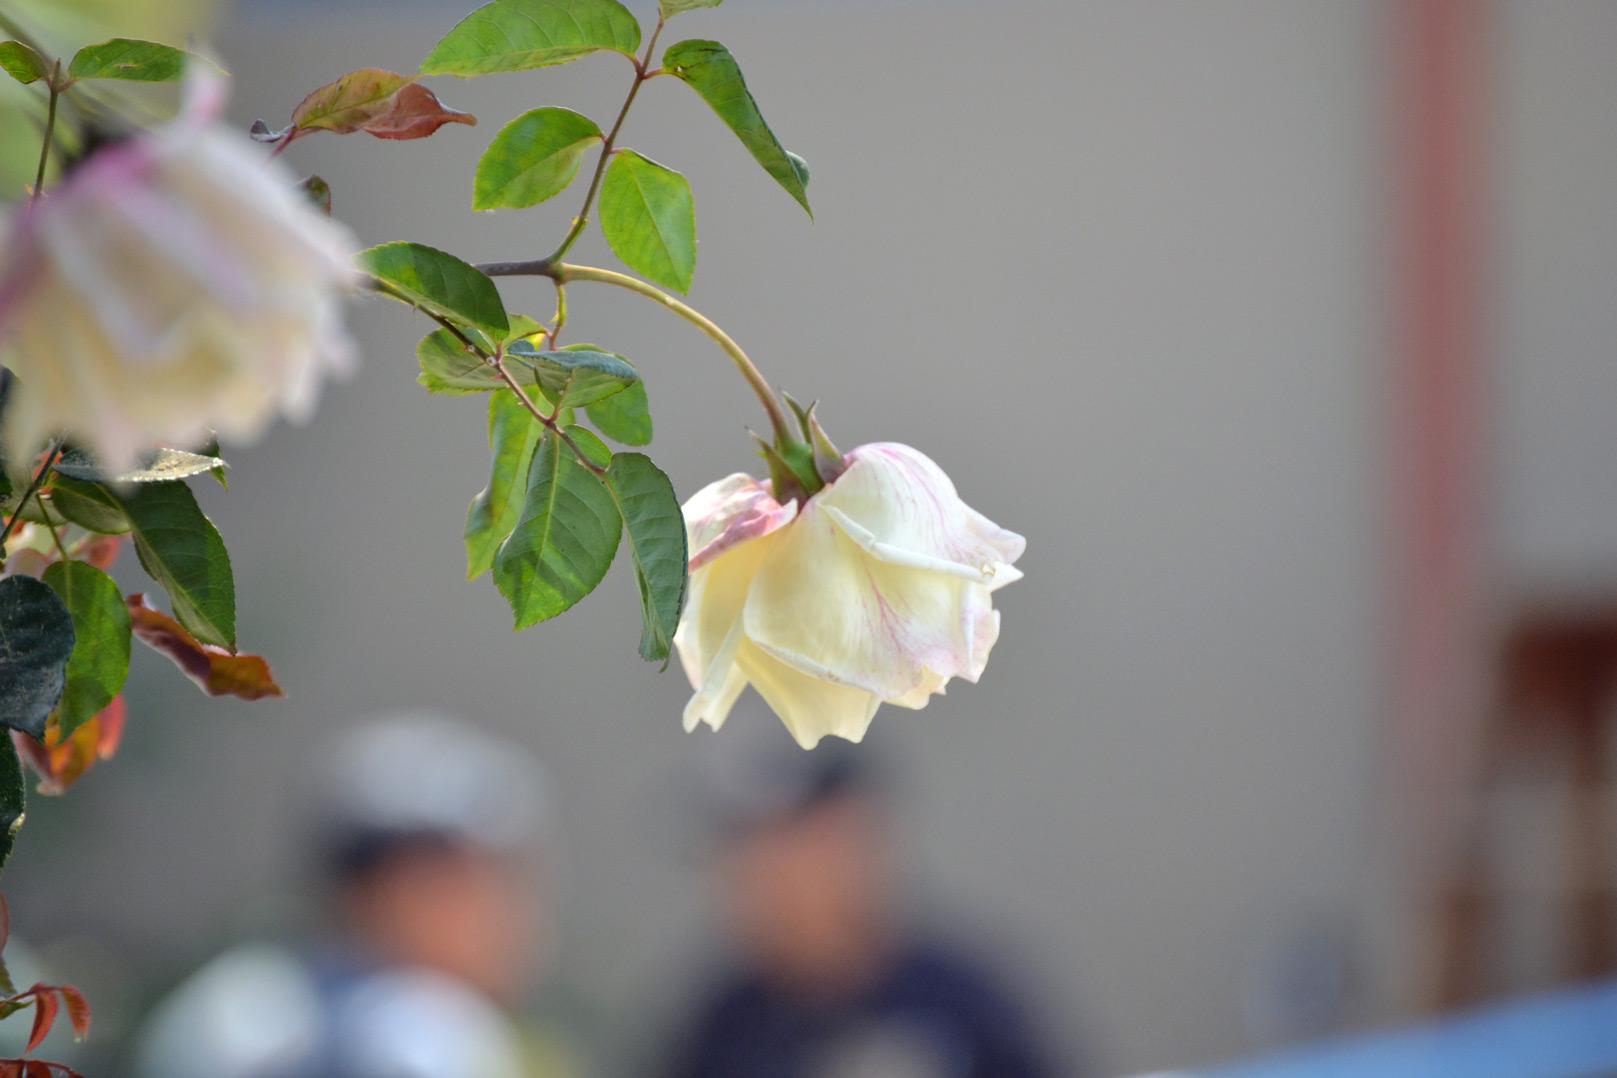 don-carlos-familia-alvarado-restauranteros-xela-foodie-tour-guatemala-mister-menu-familiar-reportaje-tertulianos-chalet-pablo-jardin-rosa